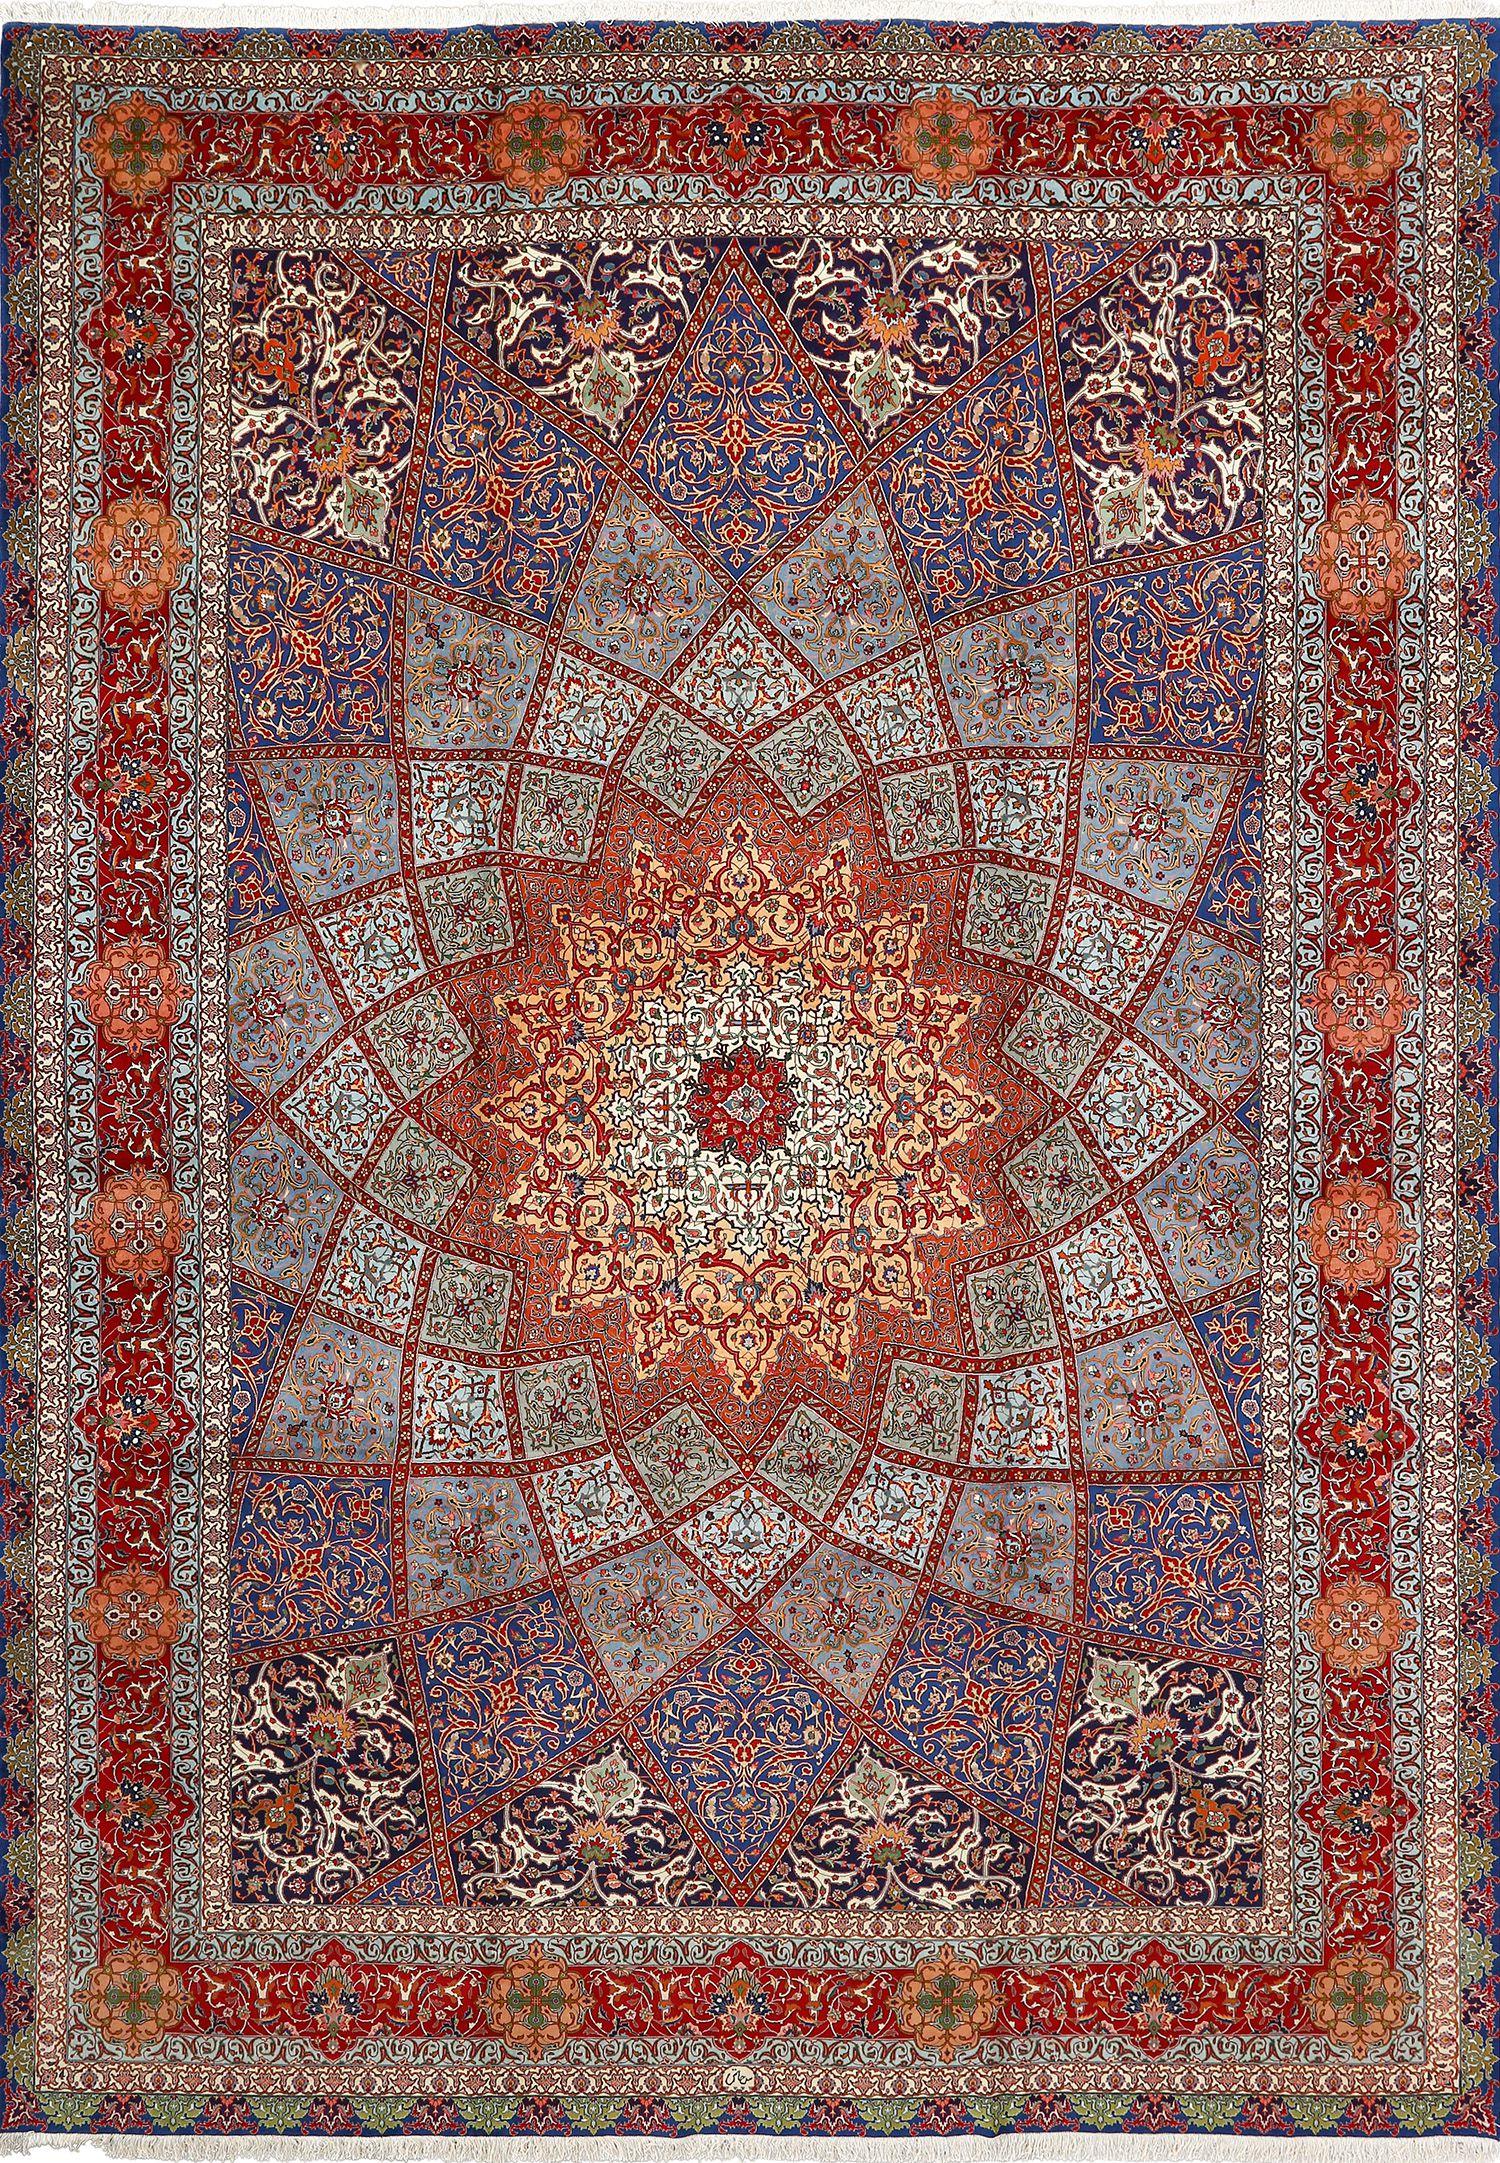 persian carpets persian carpet plus turkish rug large plus inexpensive turkish rugs plus EBOTAEK